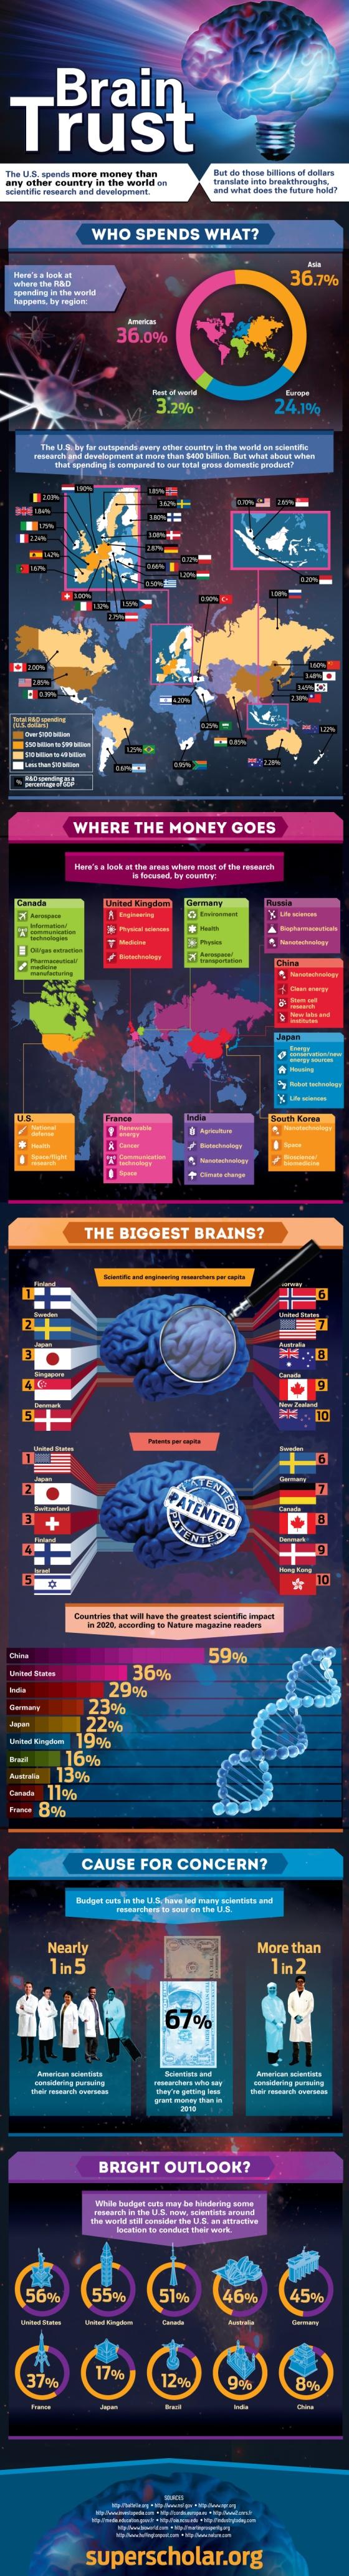 Infographic : Brain Trust